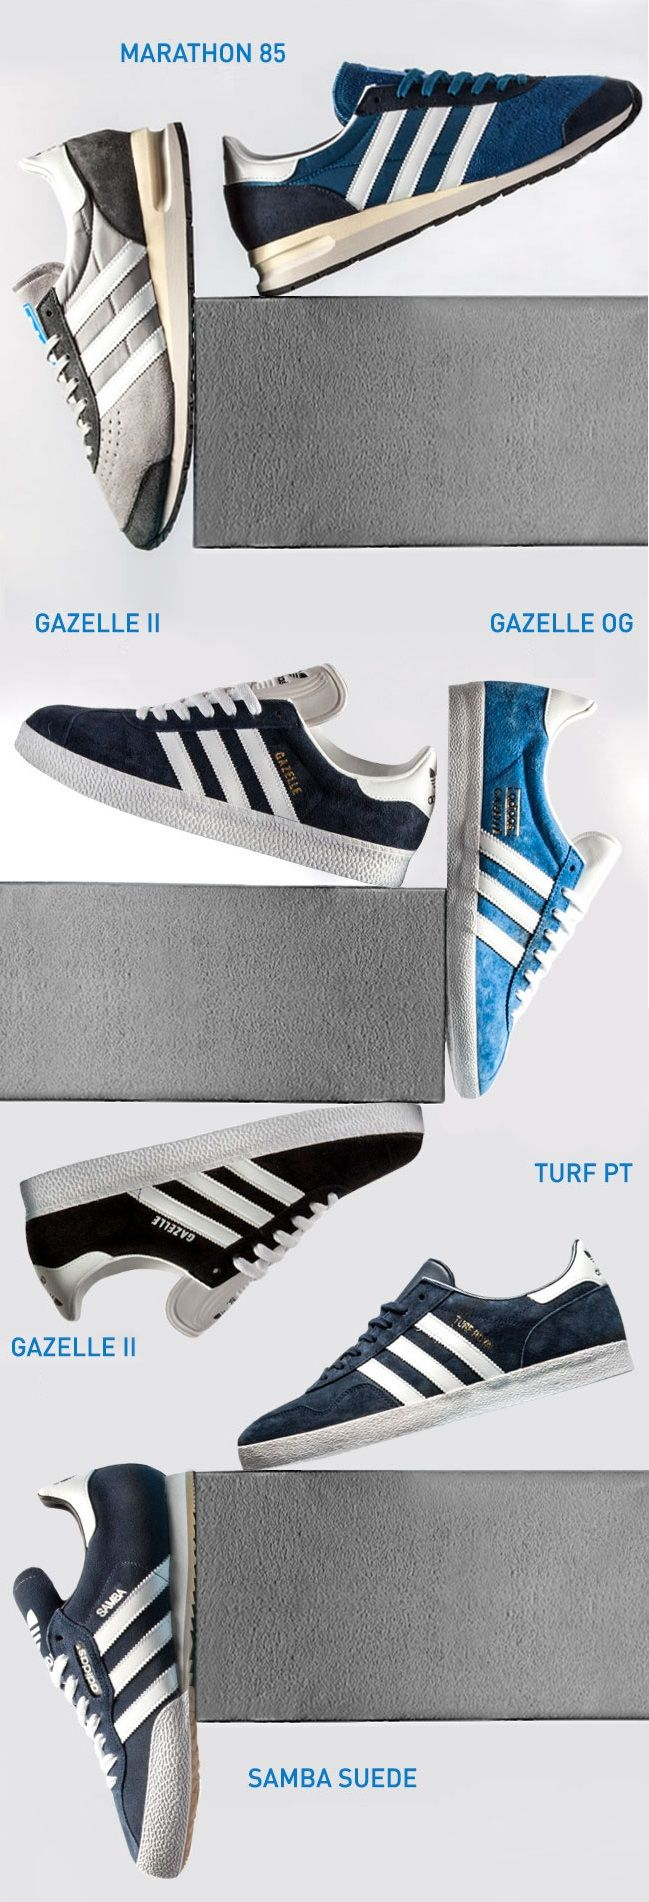 adidas Originals - Marathon 85, Tuft PT, Samba Suede, Gazelle OG, Gazelle